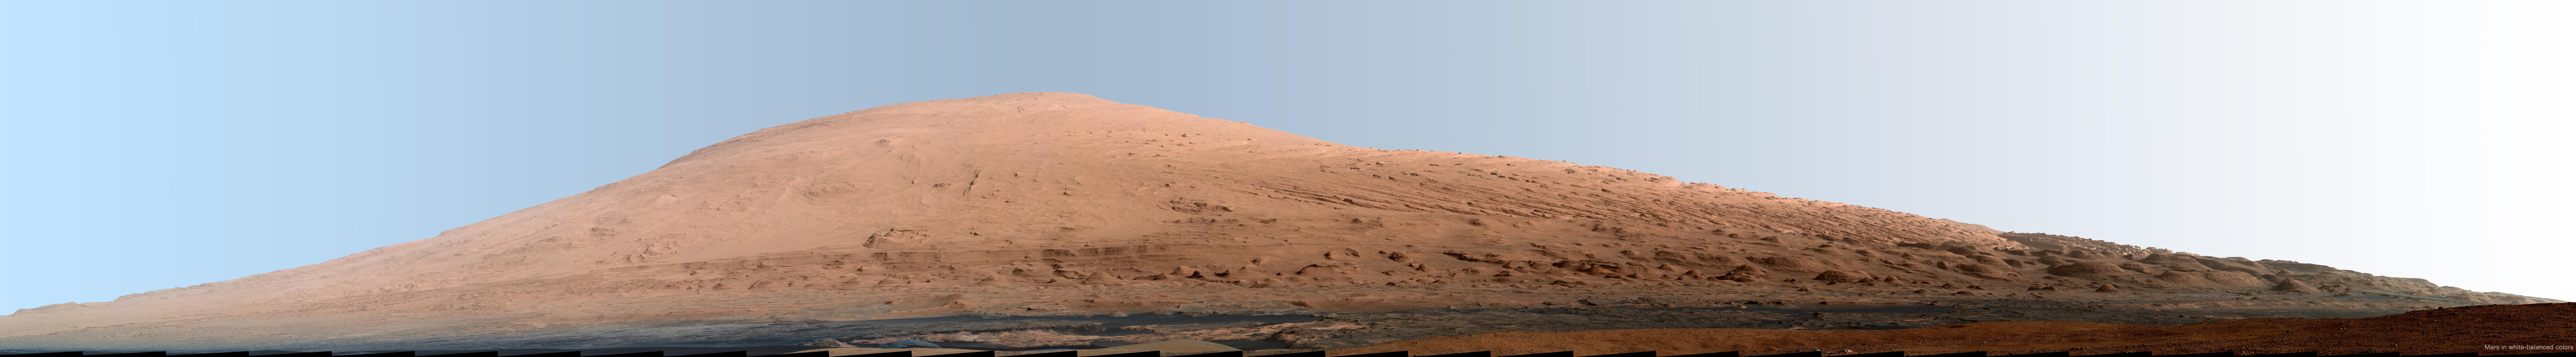 Rover Curiosity: Panorama des Aeolis Mons